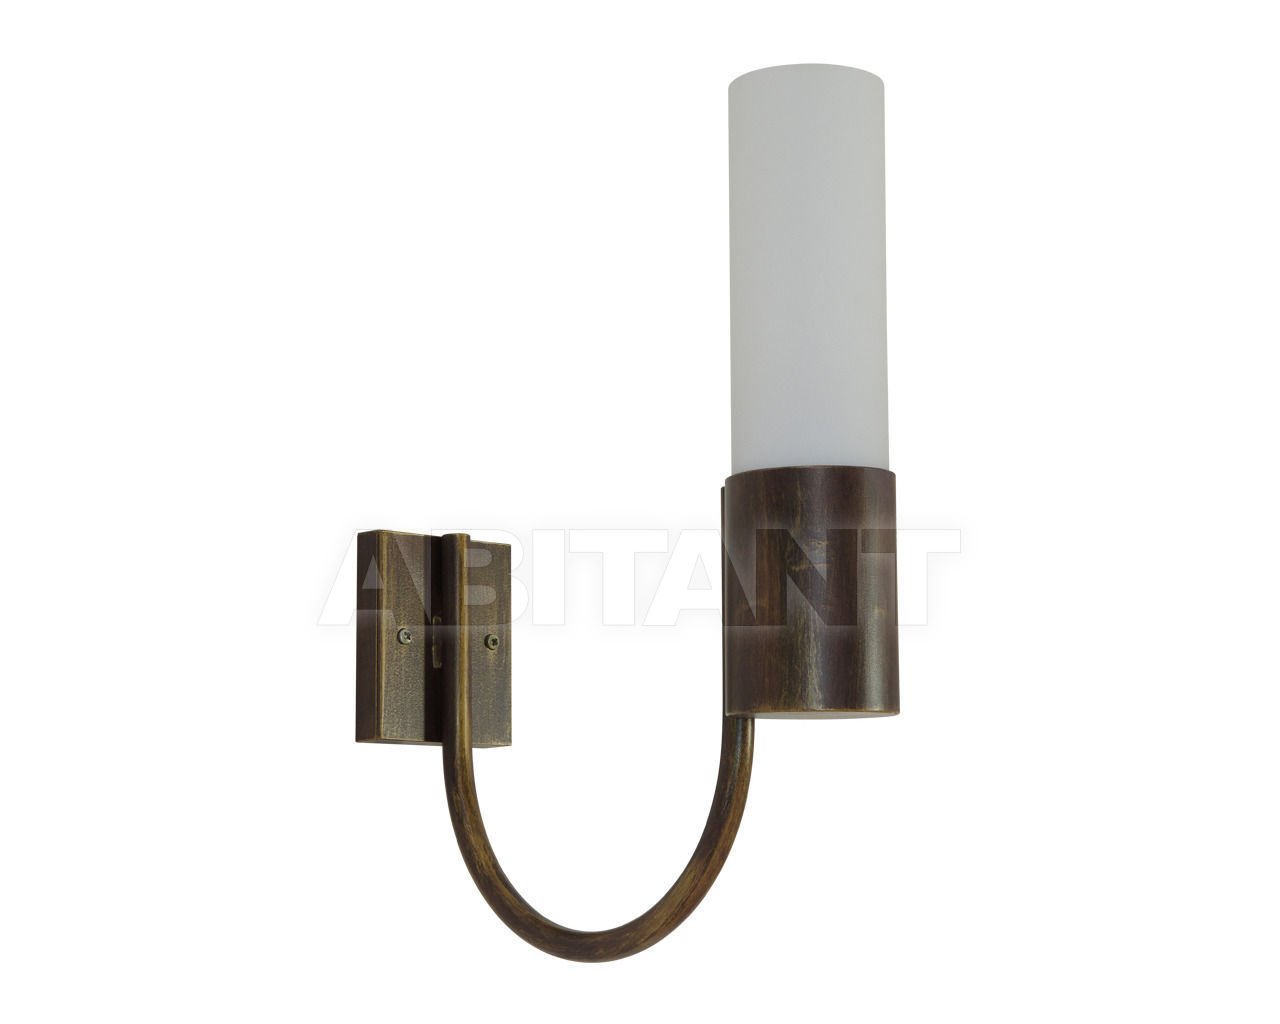 Купить Светильник настенный FMB Leuchten Schmiedeeisen Lampen Und Leuchten 94470